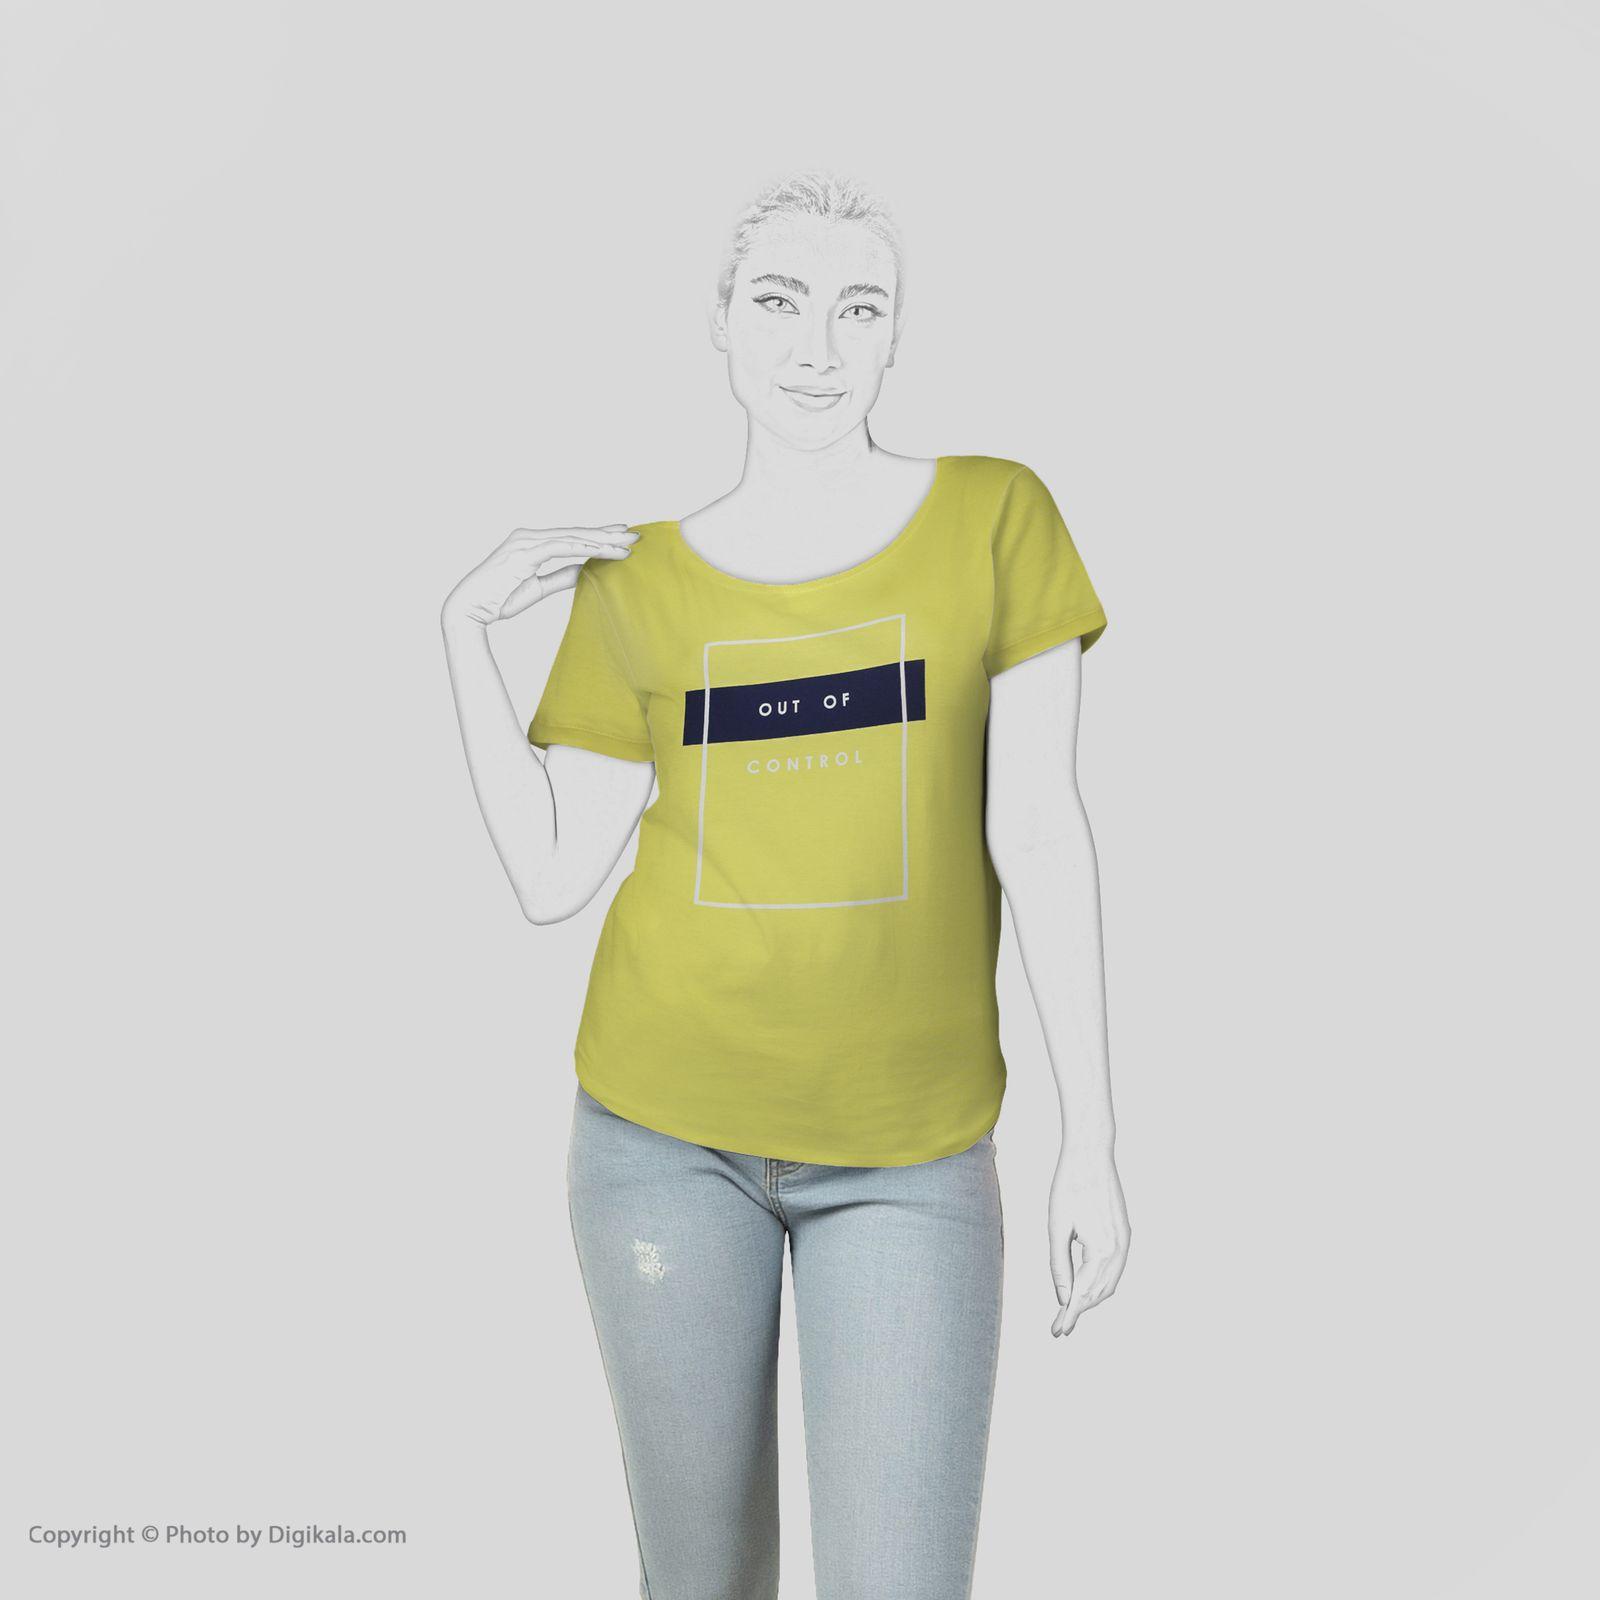 تی شرت زنانه اسپیور مدل 2W15-11 -  - 4